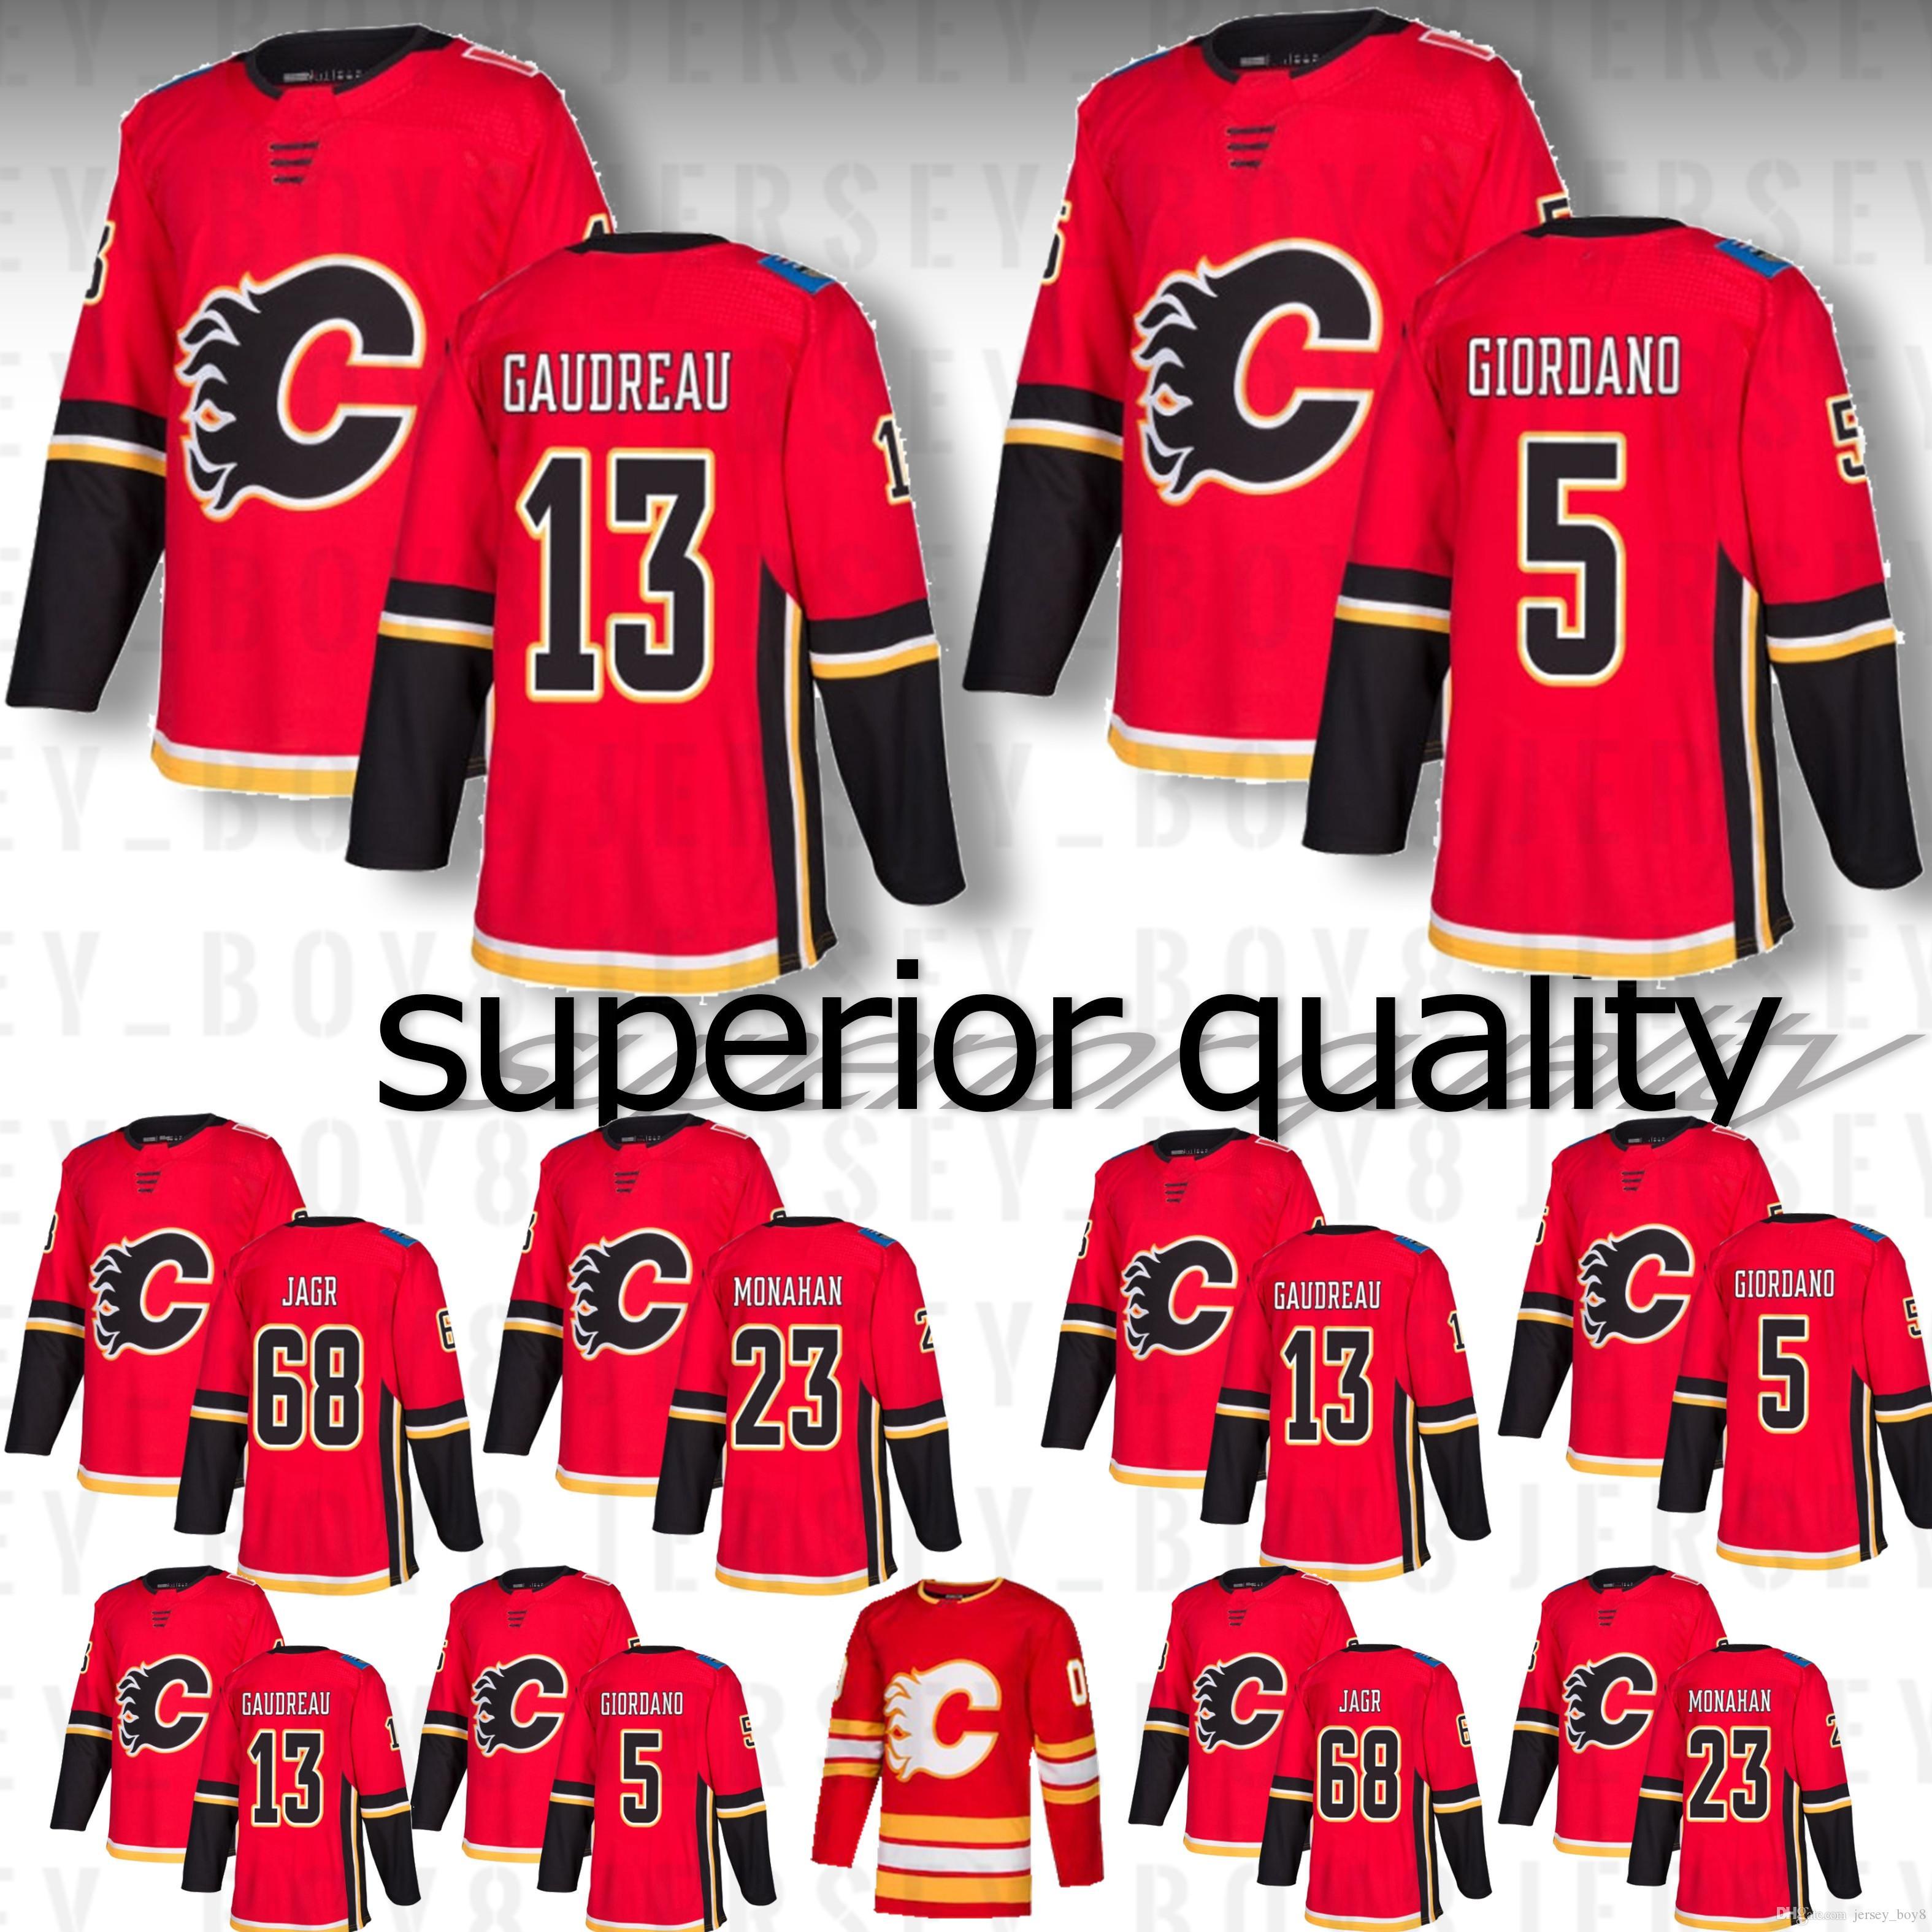 2019 2018 New Calgary Flames Season Jersey 5 Mark Giordano 13 Johnny  Gaudreau 23 Sean Monahan 68 Jaromir Jagr Stitched Hockey Jerseys From  Jersey boy8 59a455d8a